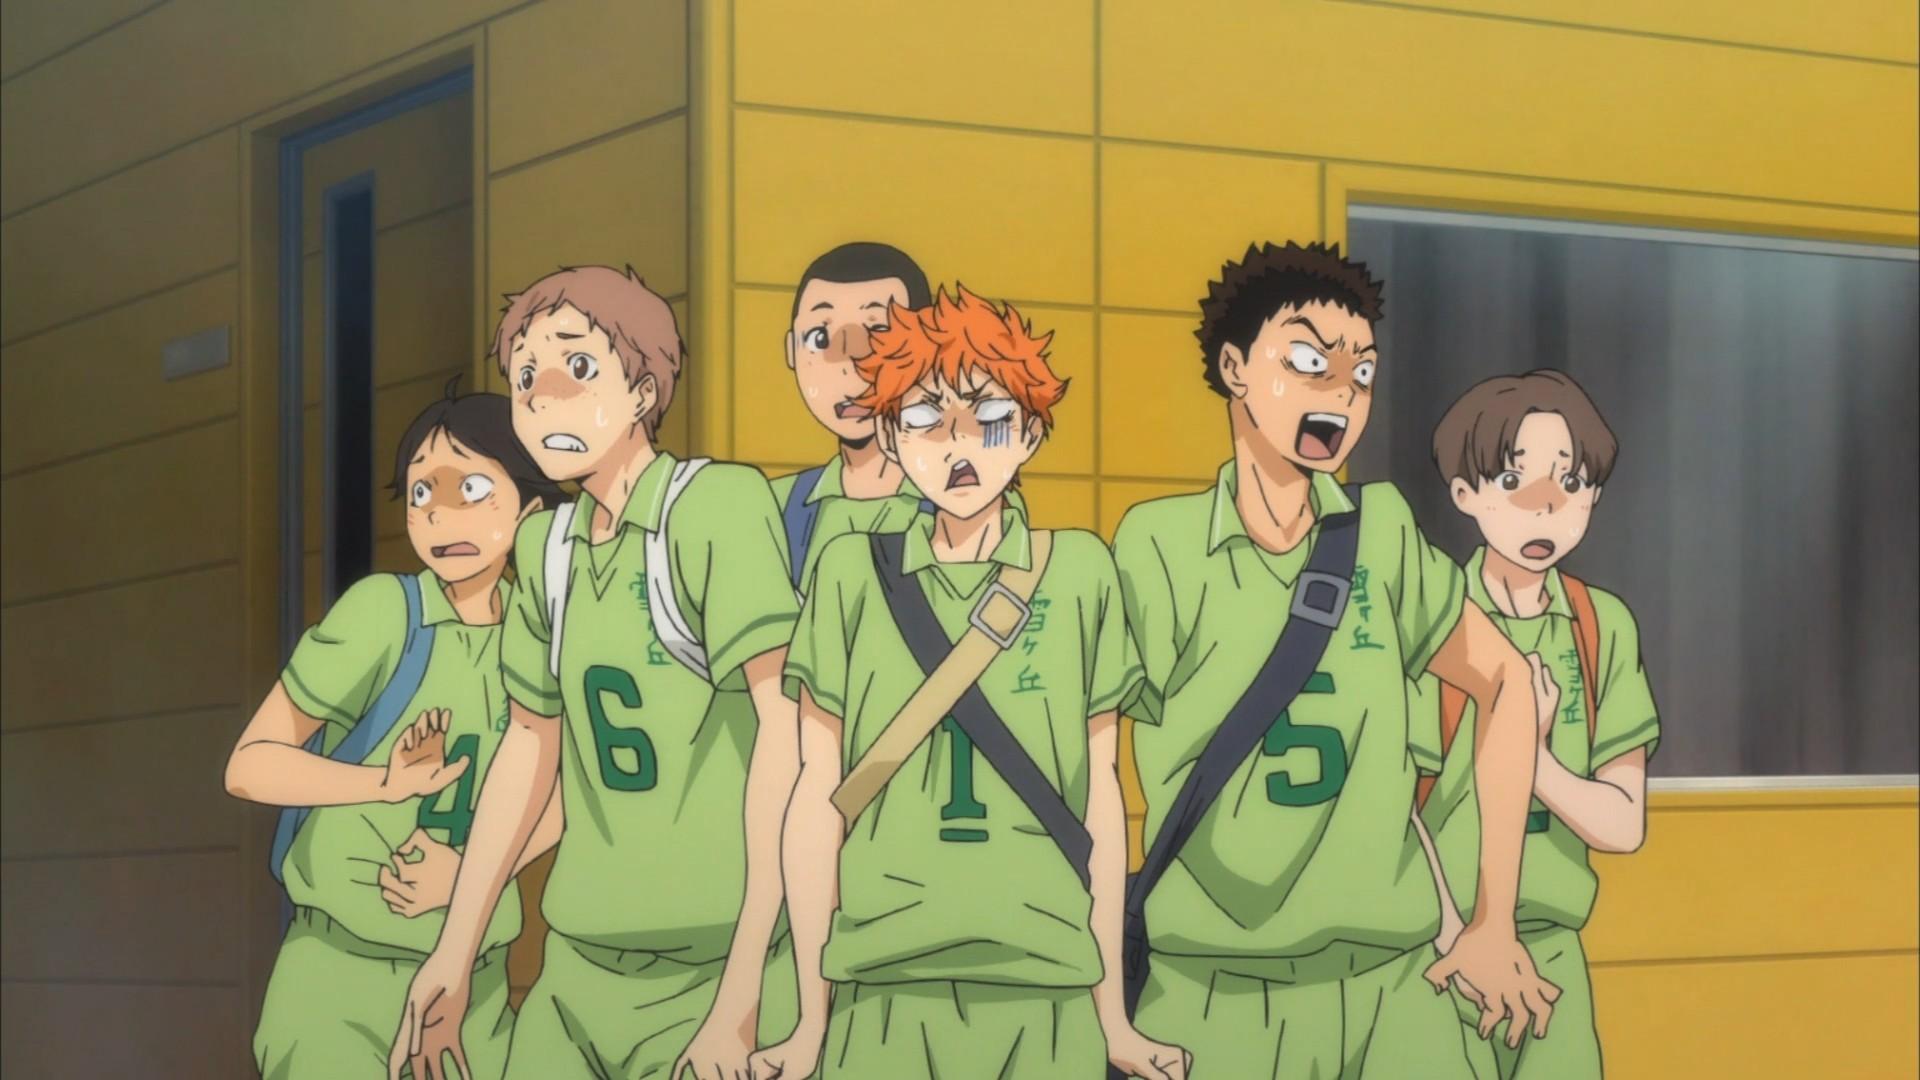 Best Anime Wallpaper Haikyuu Hd Images